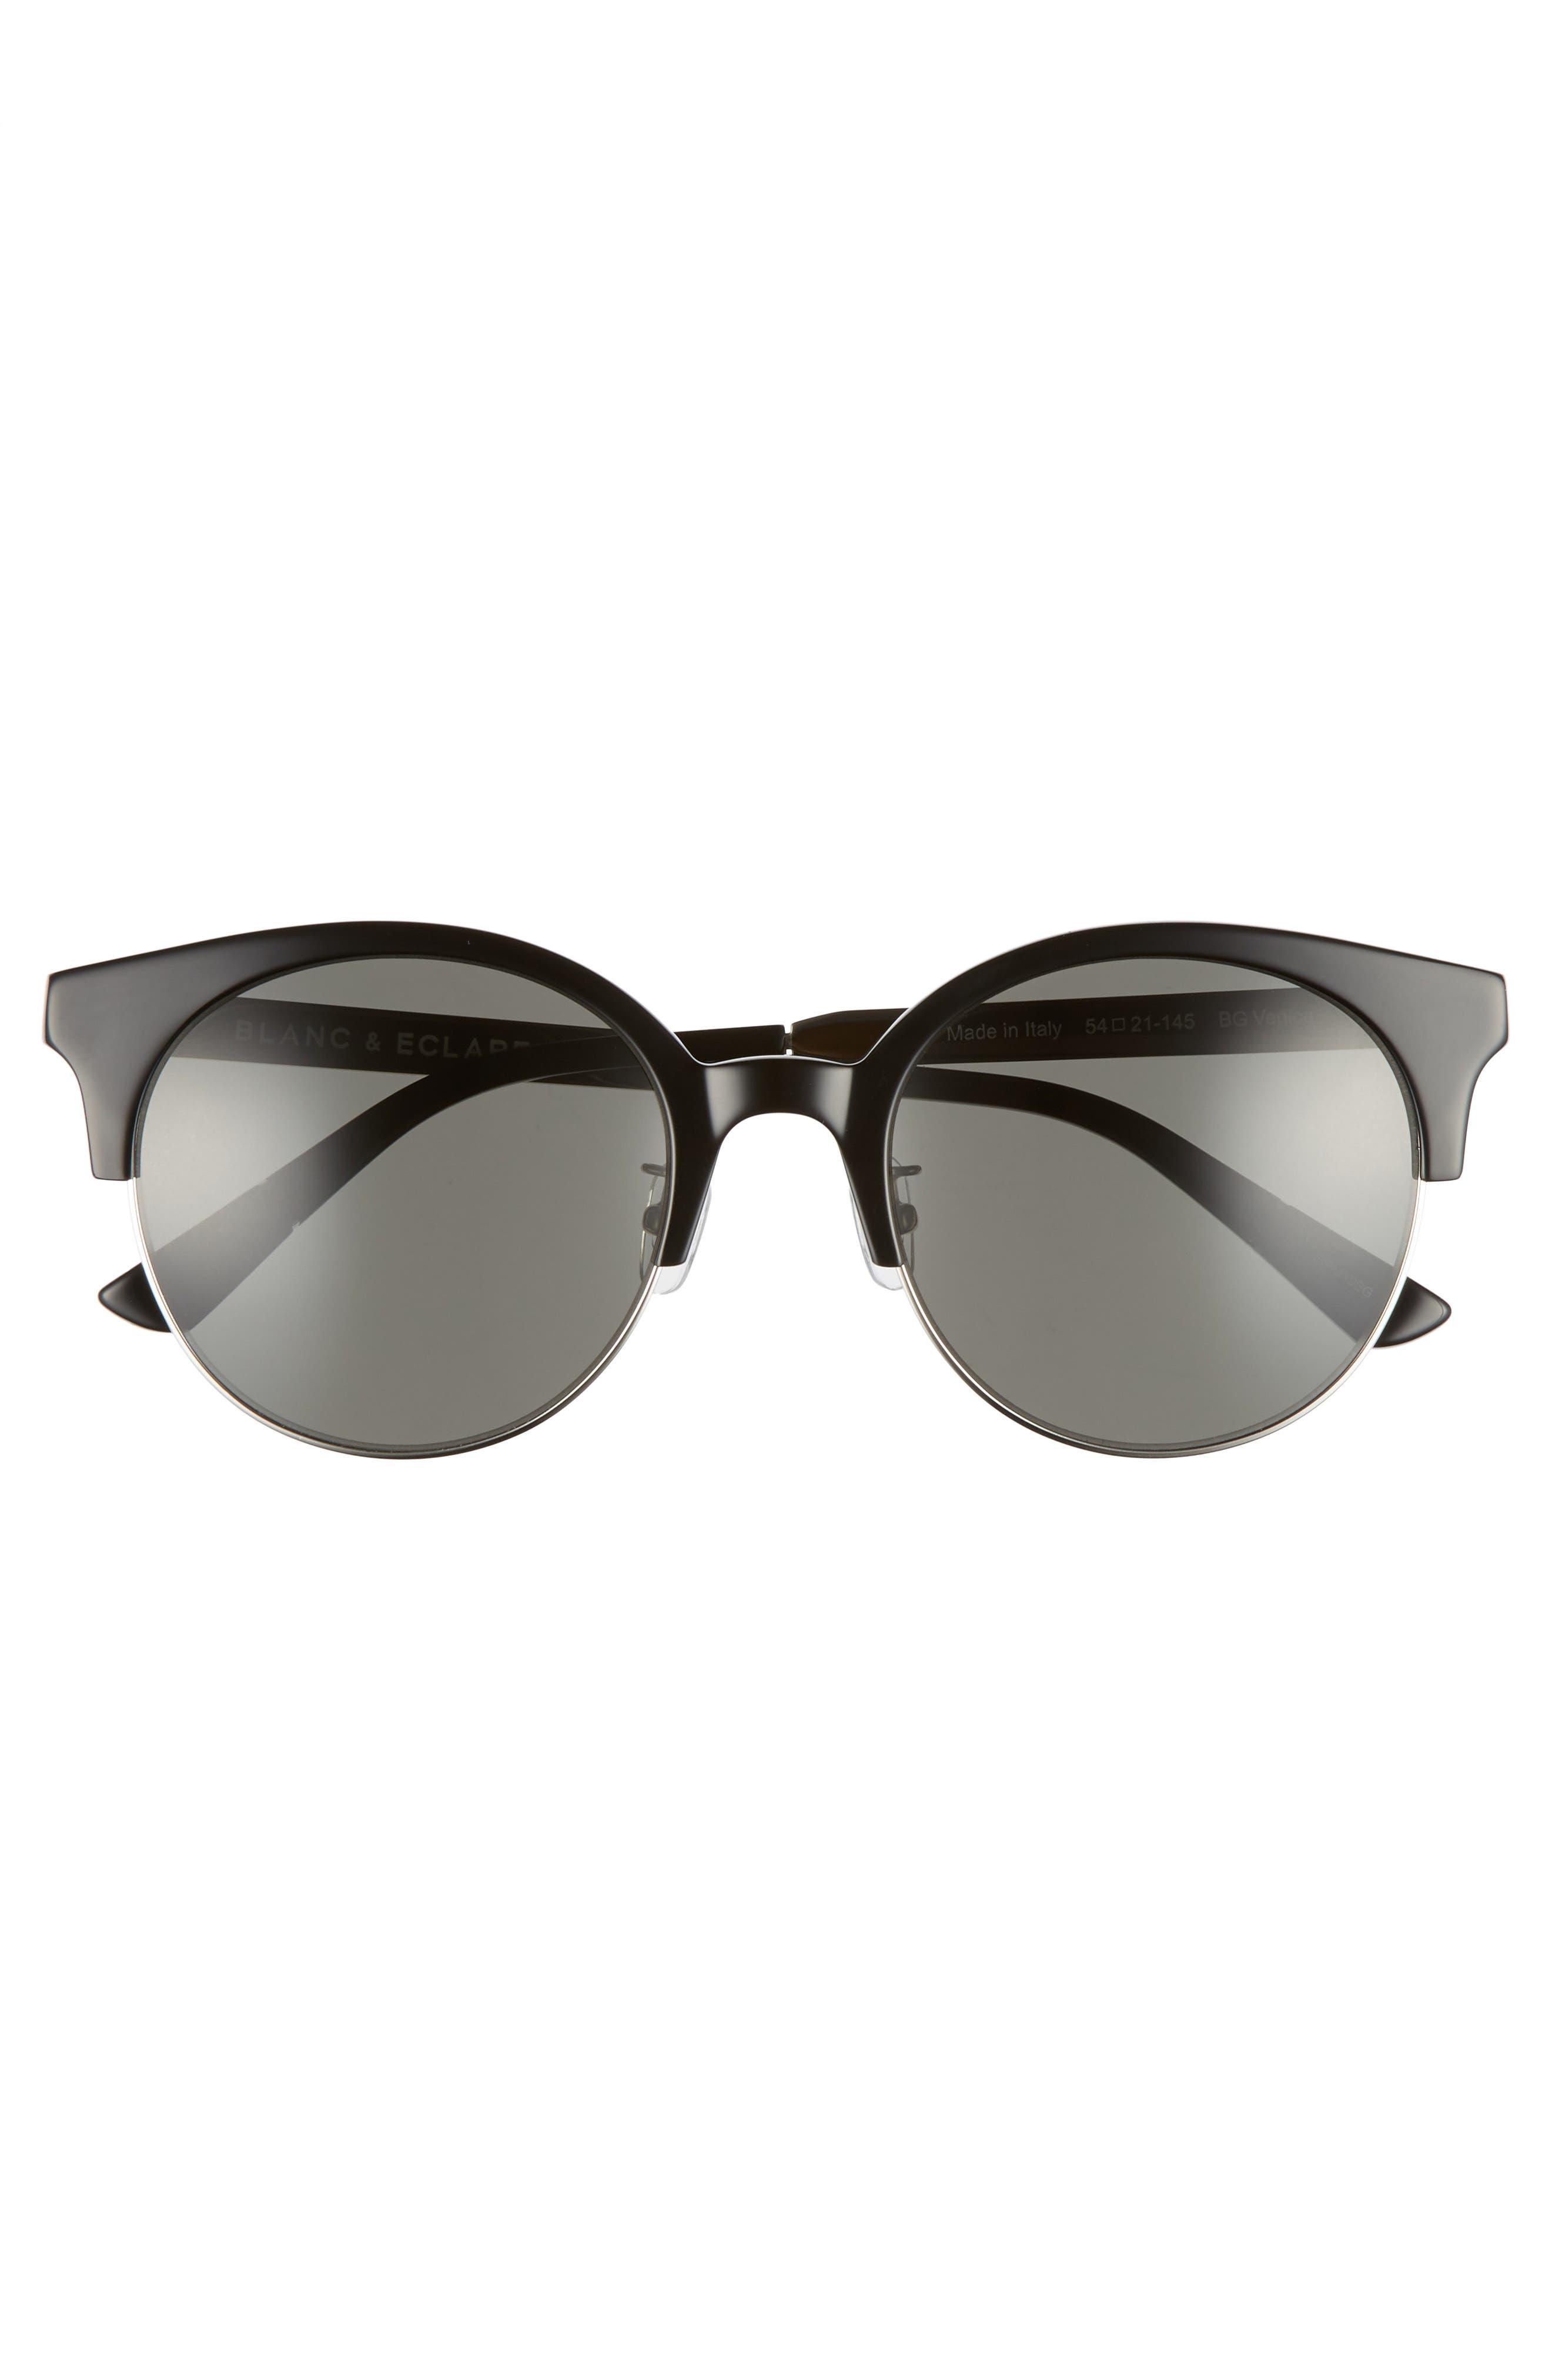 BLANC & ECLARE Venice Round Sunglasses,                             Alternate thumbnail 3, color,                             001